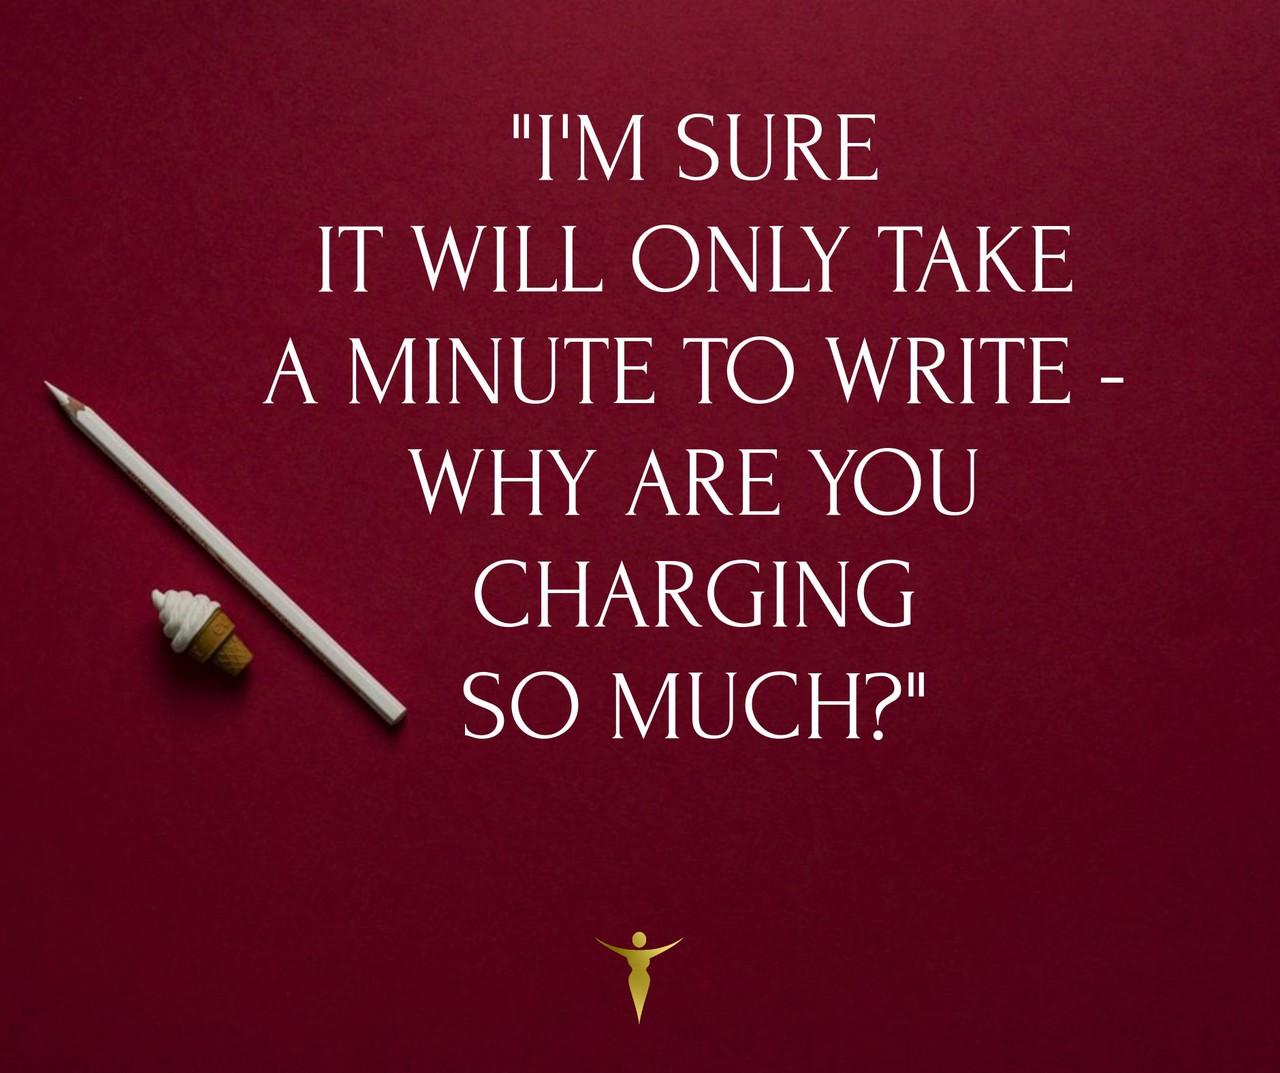 A minute to write.jpg